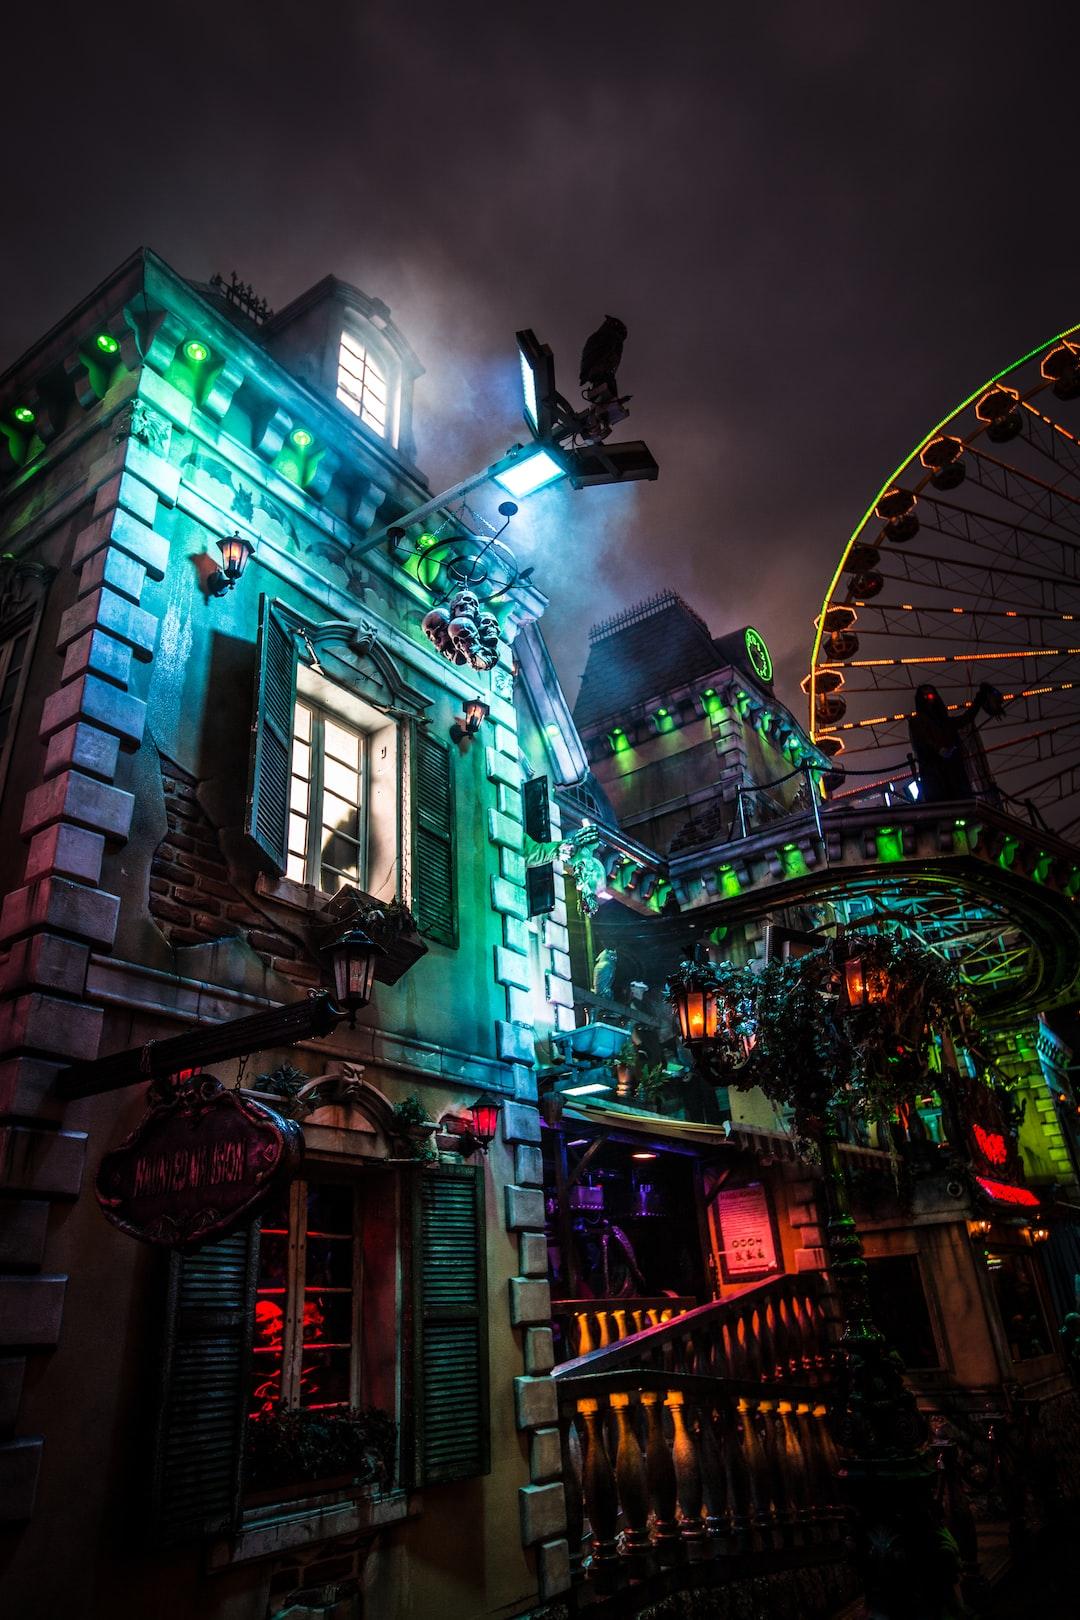 Haunted House on Funfair